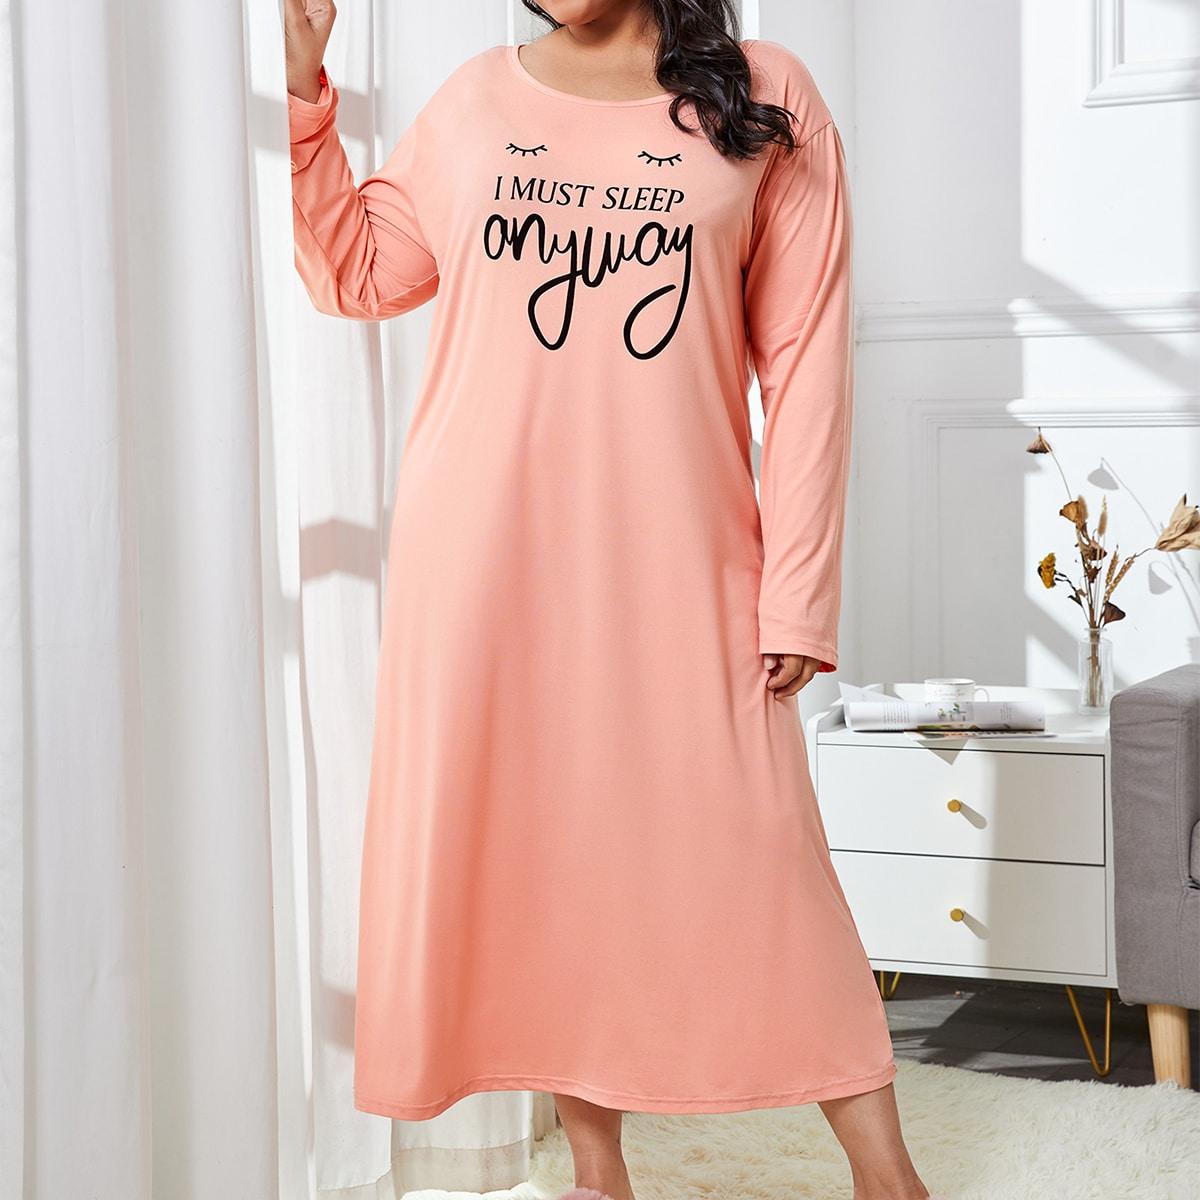 SHEIN / Plus Eyelash & Slogan Graphic Longline Night Dress